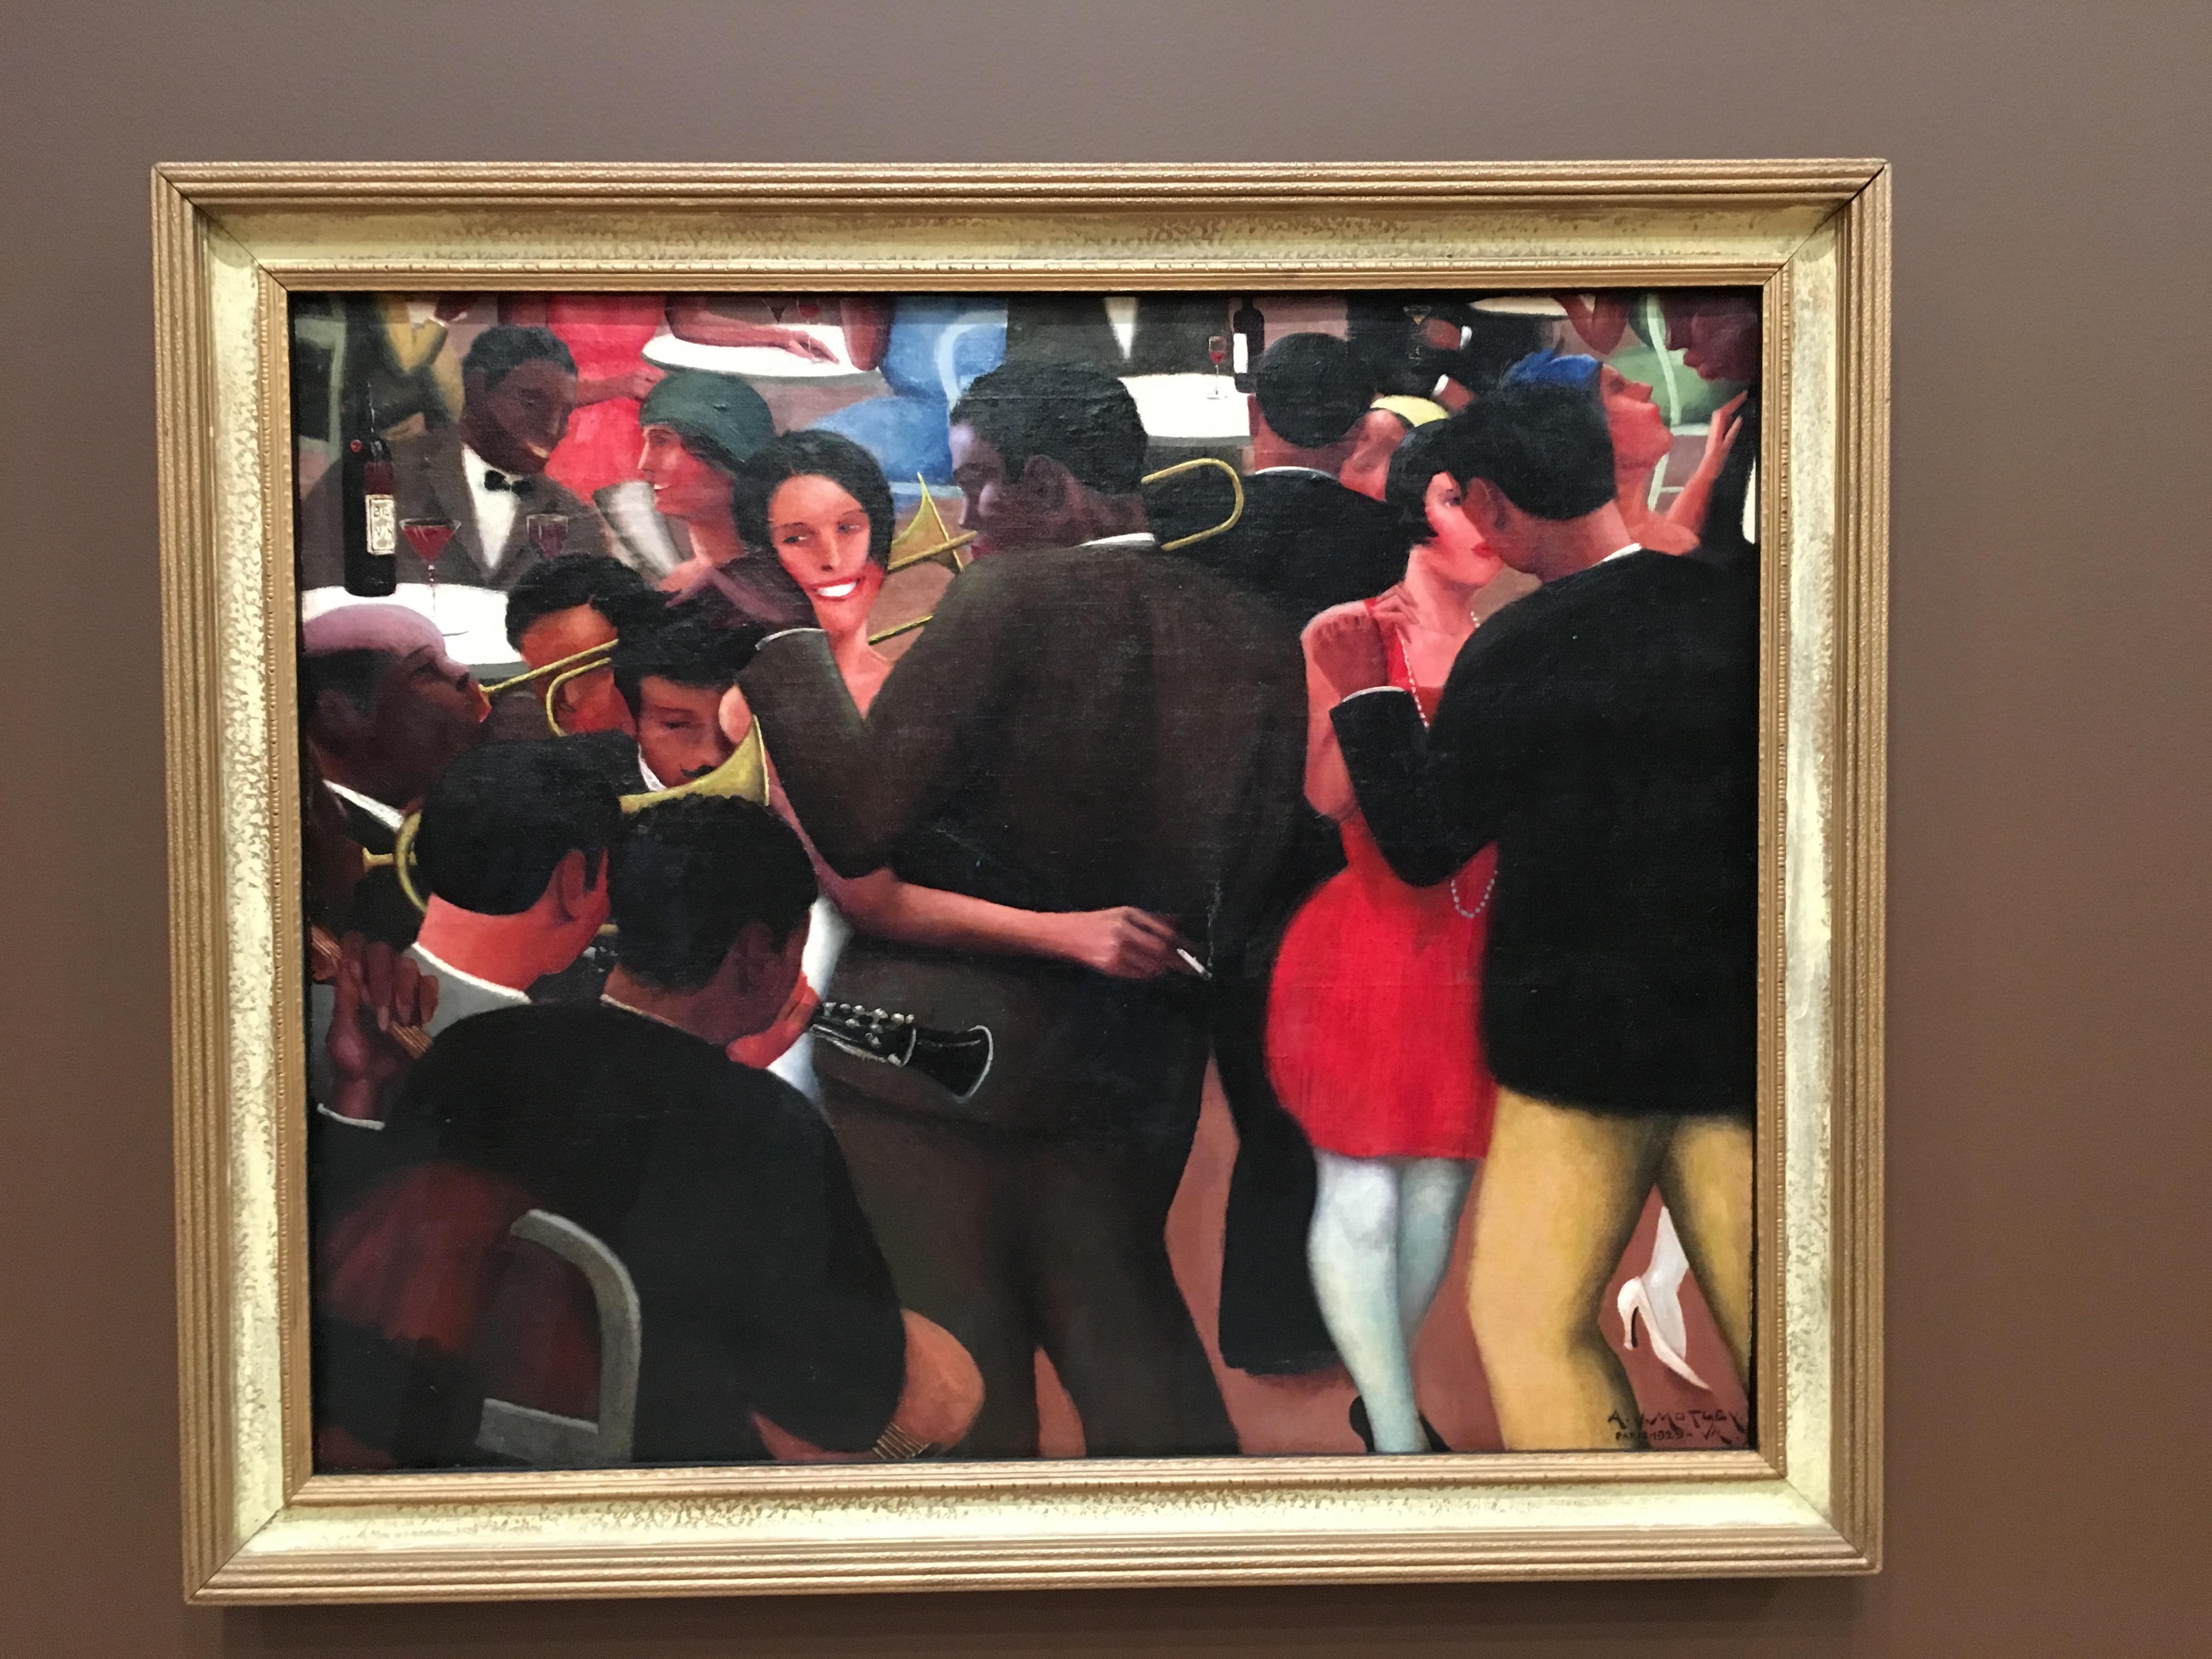 Archibald Motley: Jazz Modernist